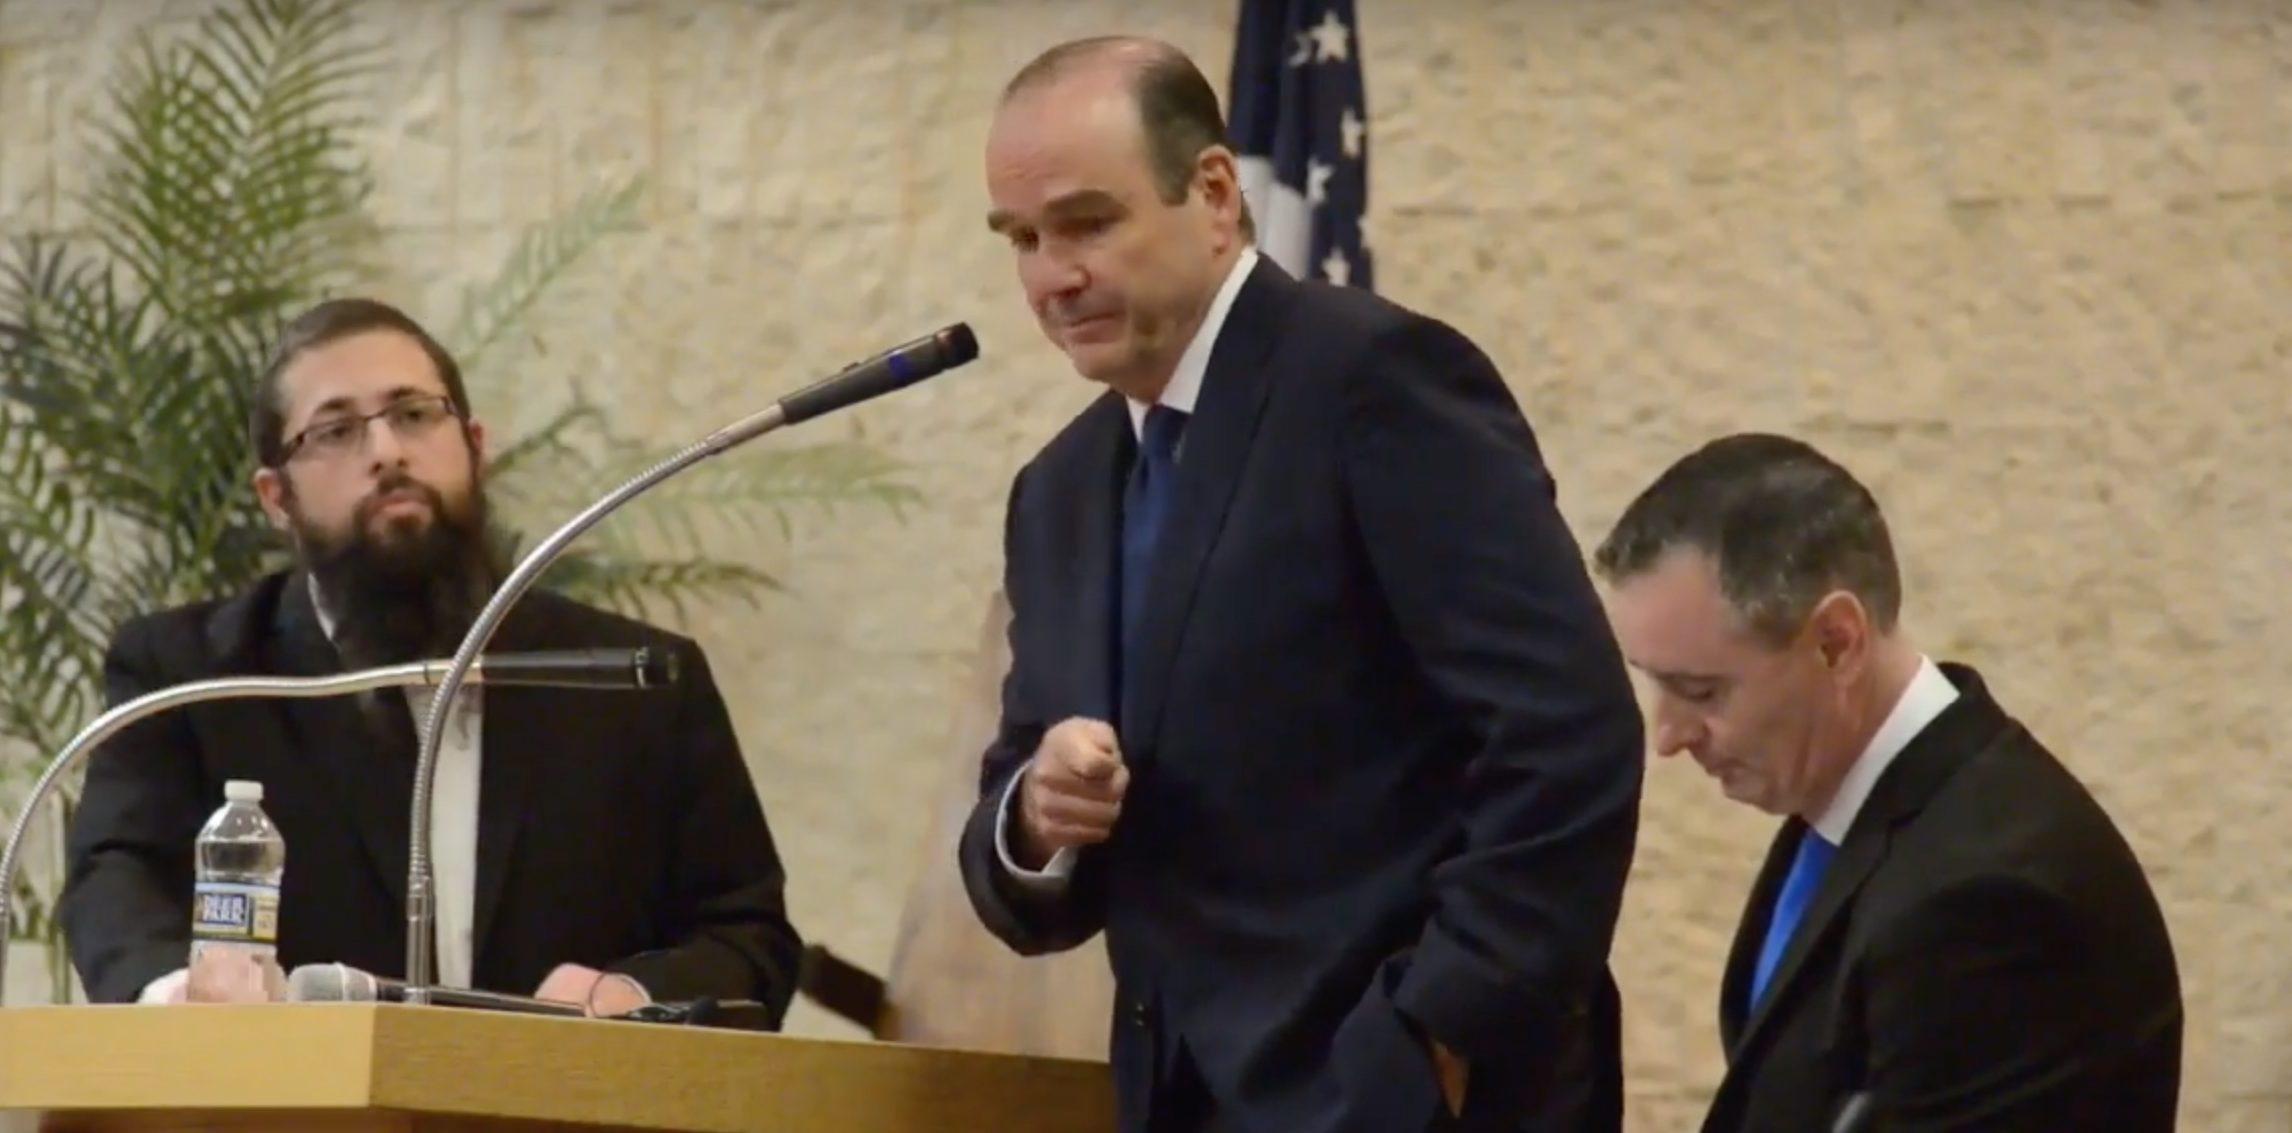 Democrat Scott Wallace faces incumbent Republican Brian Fitzpatrick in first debate. William Thomas Cain/The Intelligencer/YouTube